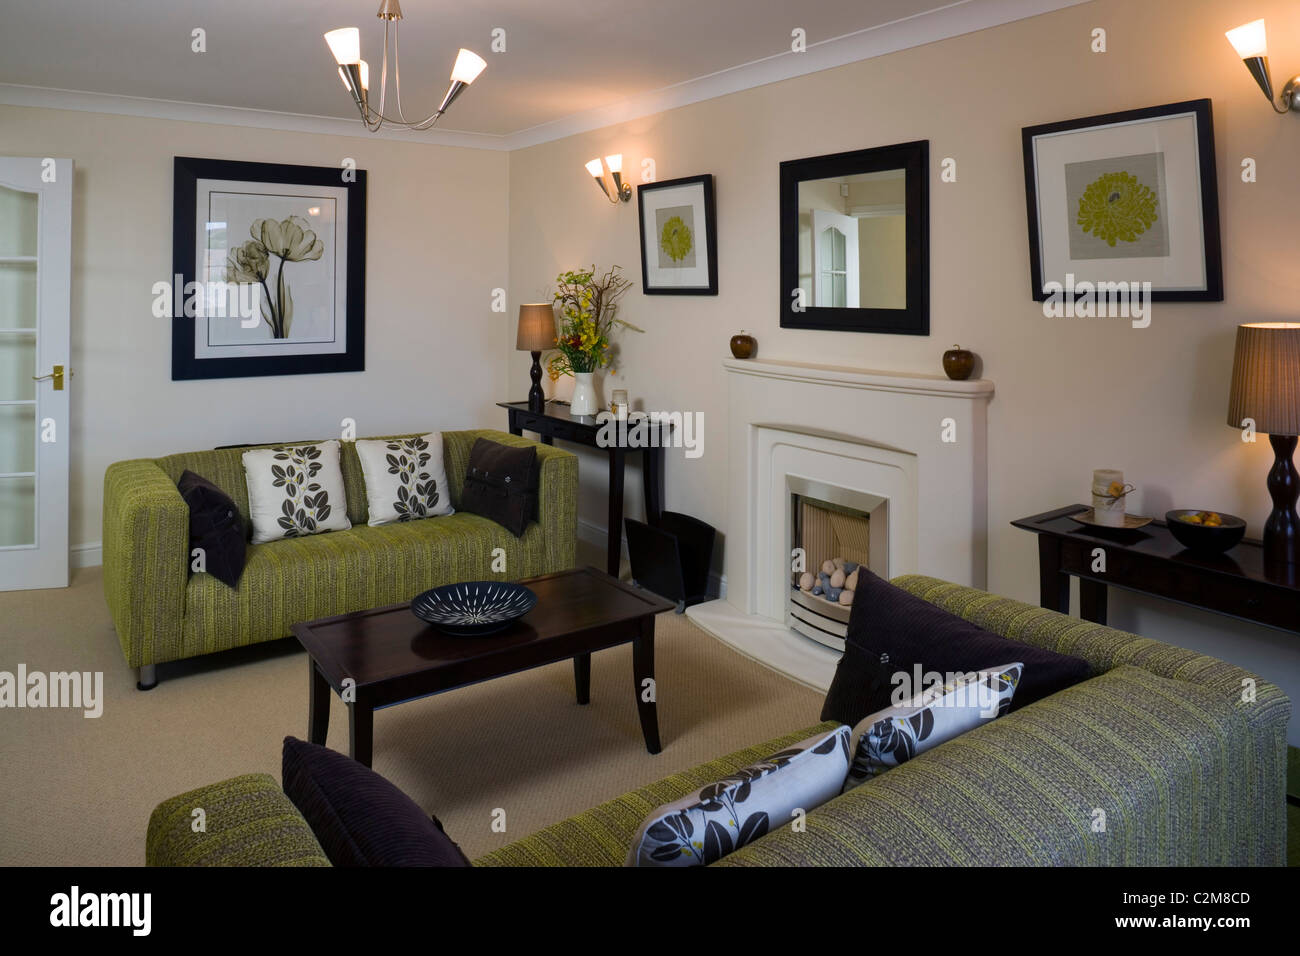 Mews Style Houses, Misterton and Retford, Nottinghamshire Stock Photo